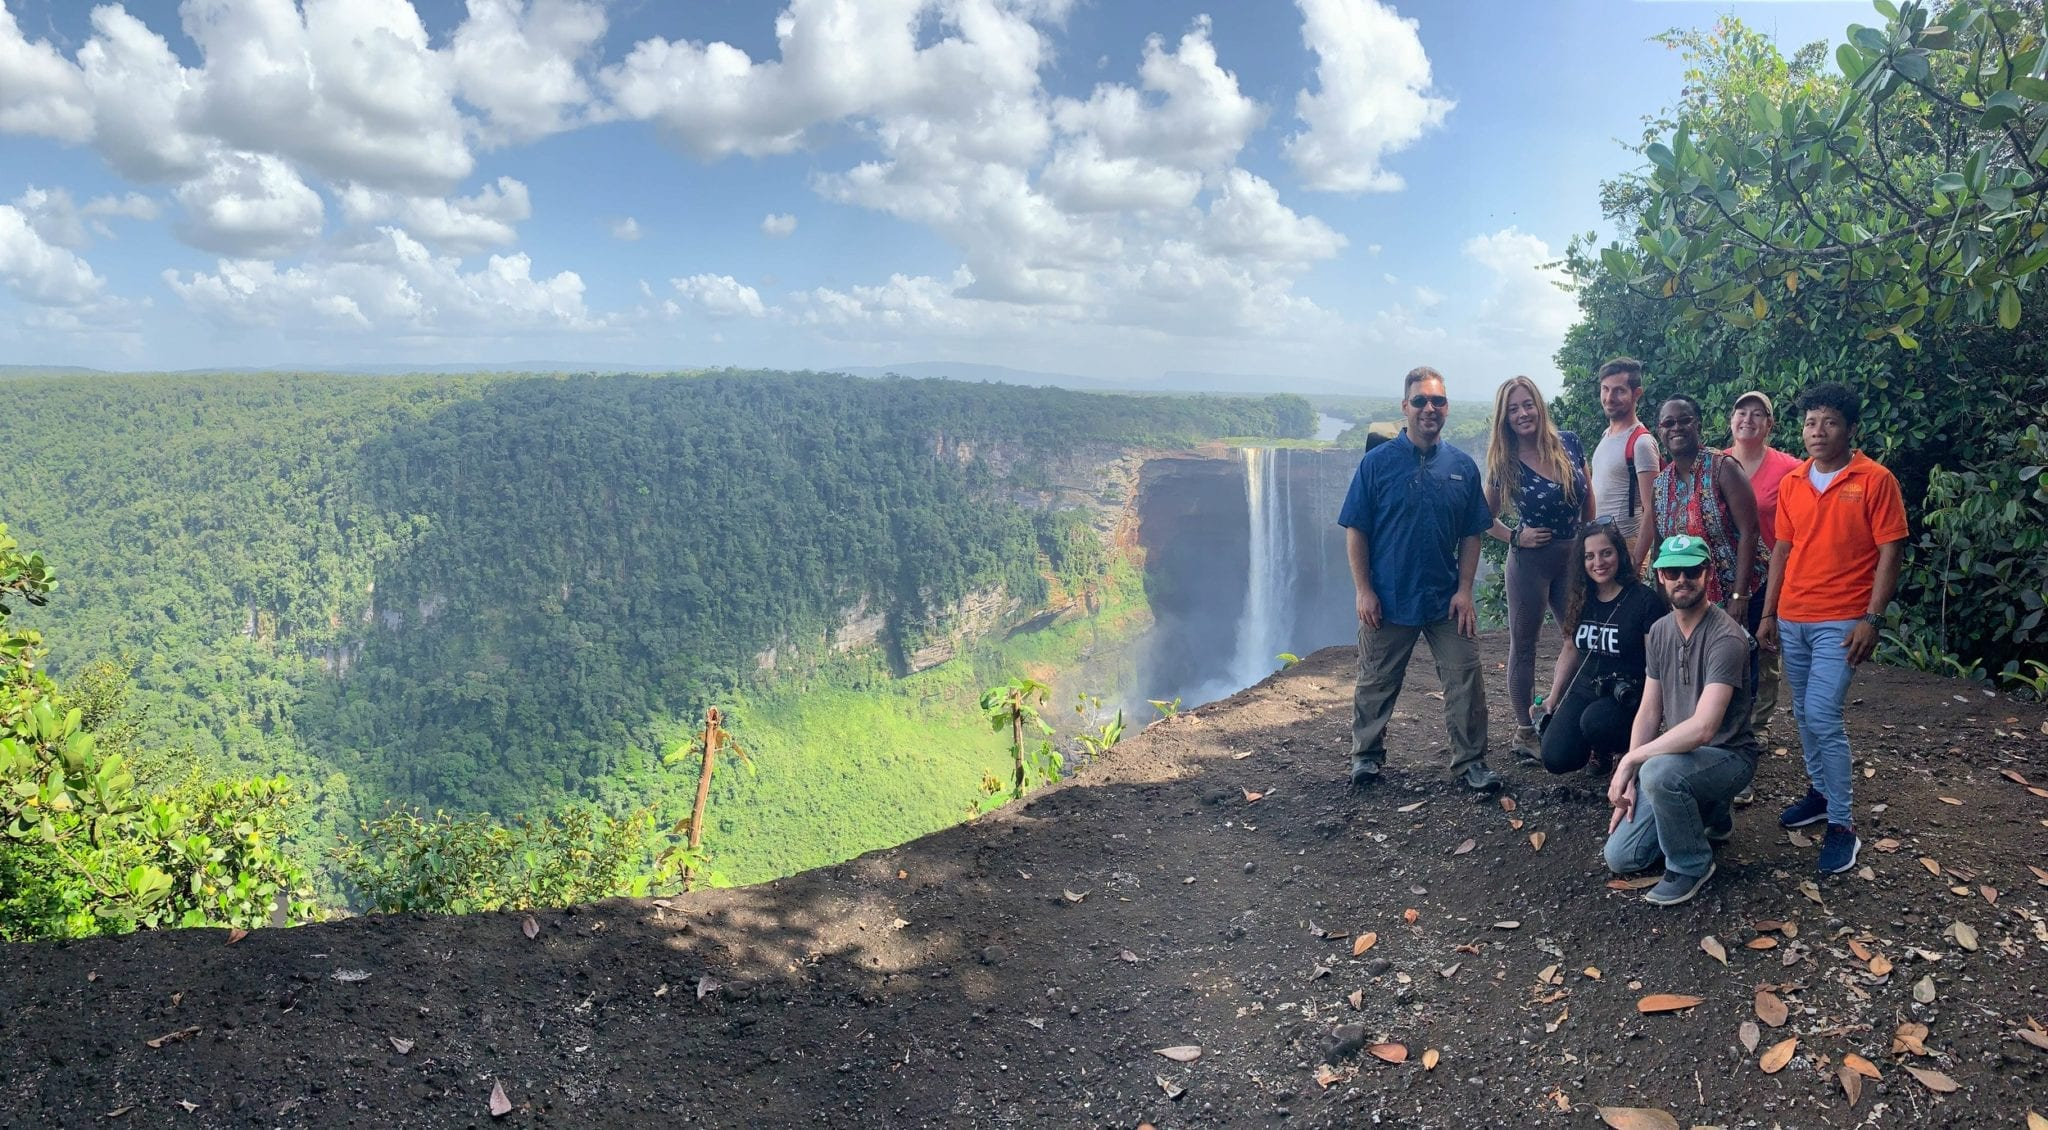 Kaiteur-Falls-Group-©-Leon-More ▷ ¿Qué es realmente como viajar a Guyana?